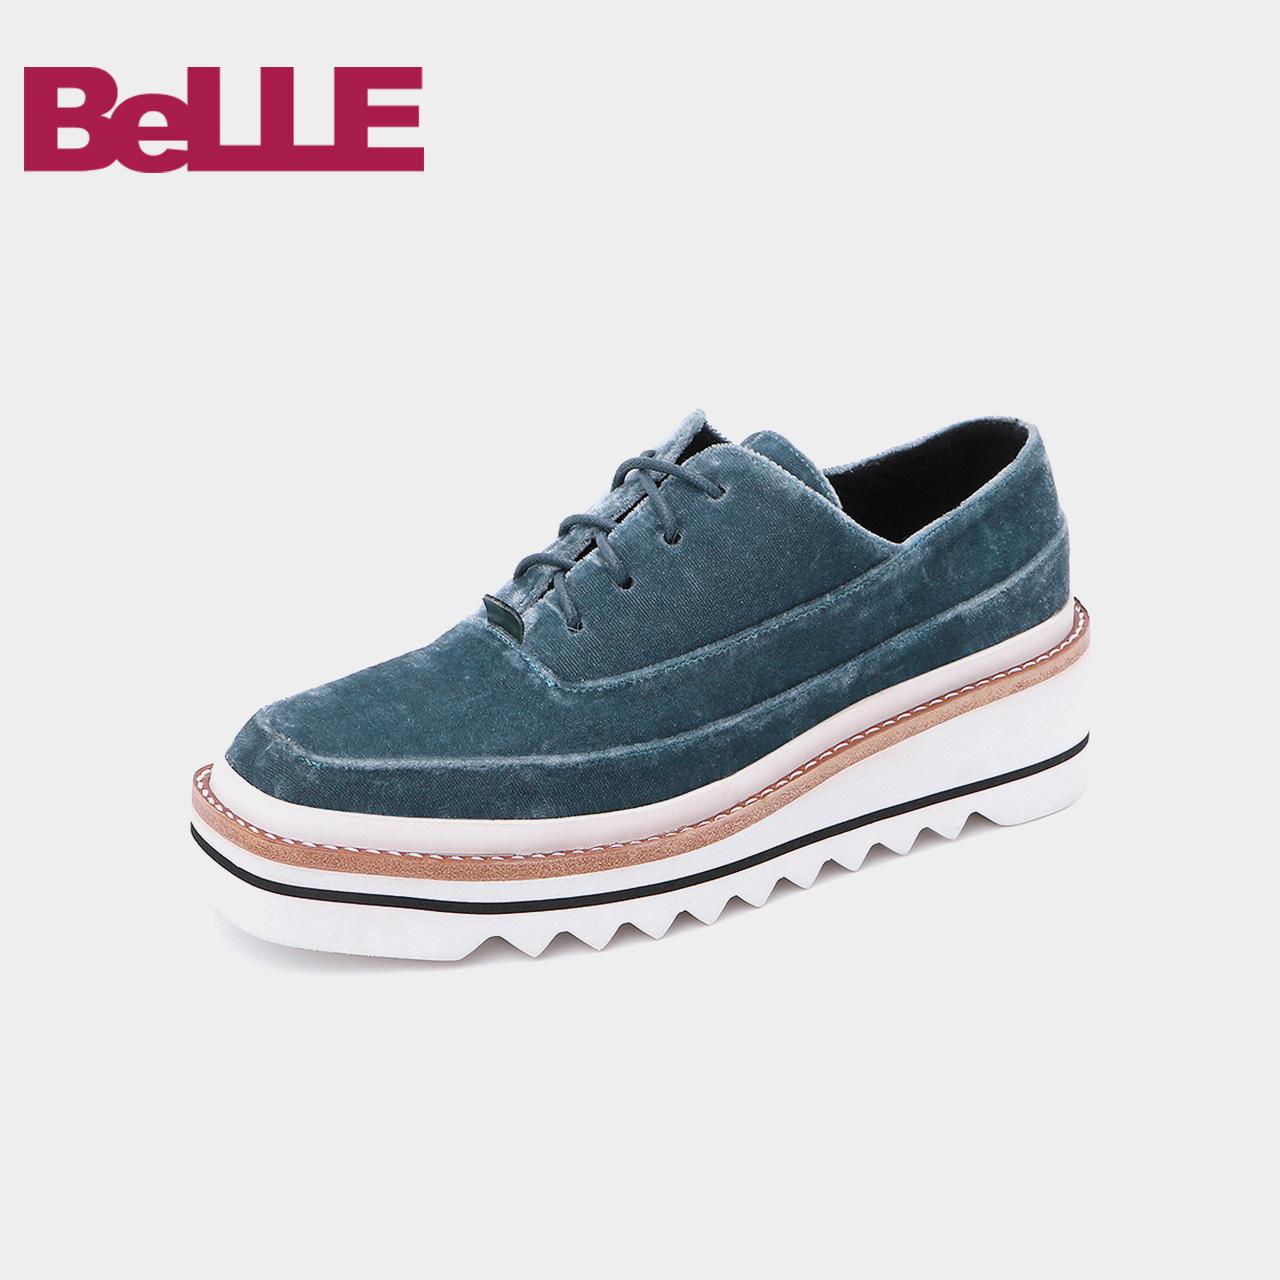 Belle-百丽松糕鞋2018秋新品商场新款厚底女休闲鞋T1Z2DCM8